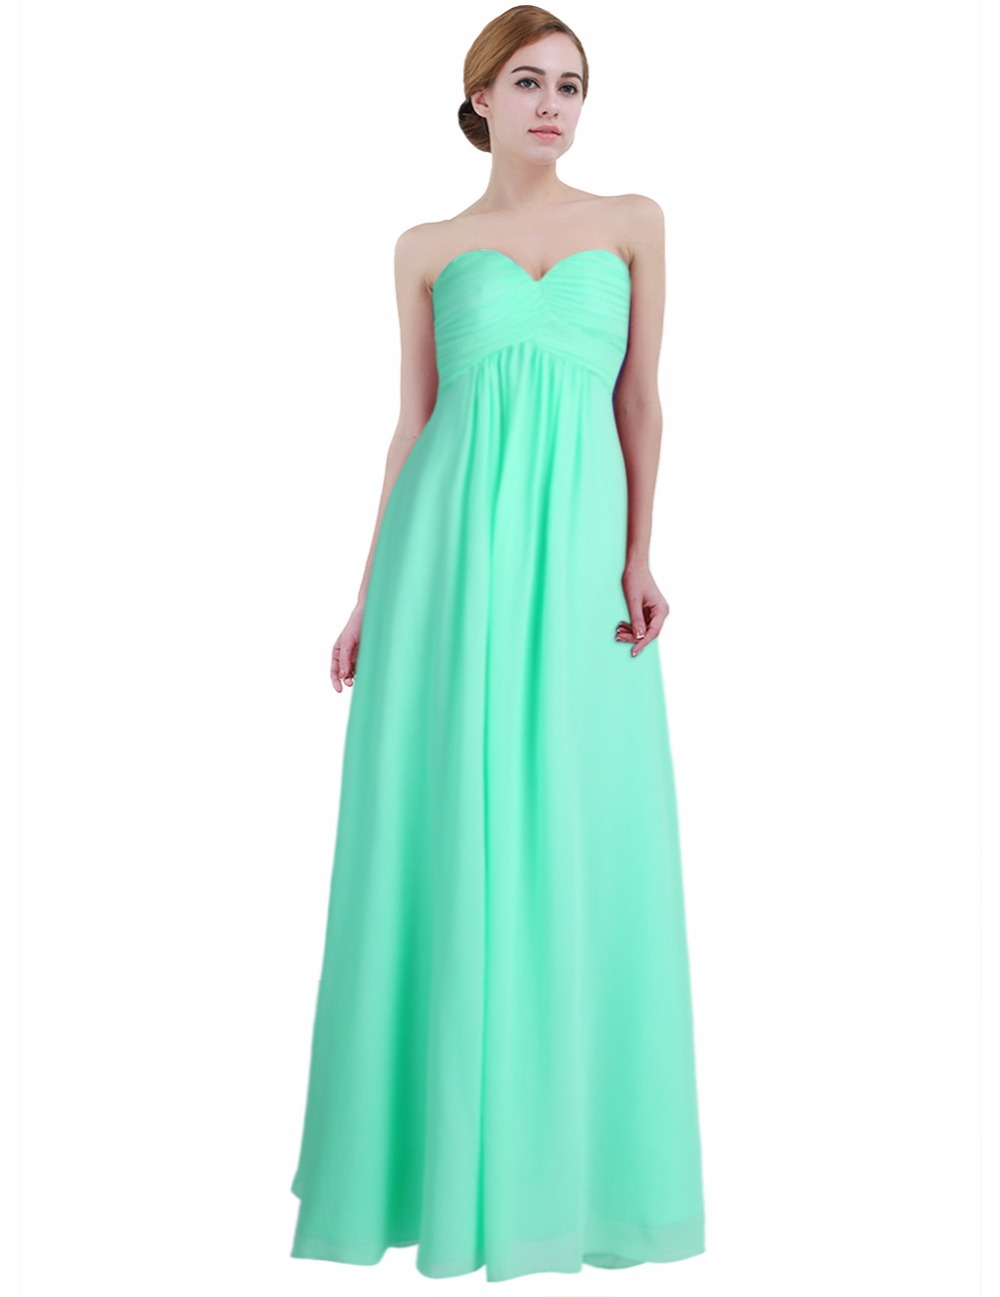 47f429b0dd550 2019 Women Dress Vestido De Festa Longo Sukienka Elegant Sexy Formal  Wedding Party Dress Strapless Chiffon Bridesmaid Maxi Dress